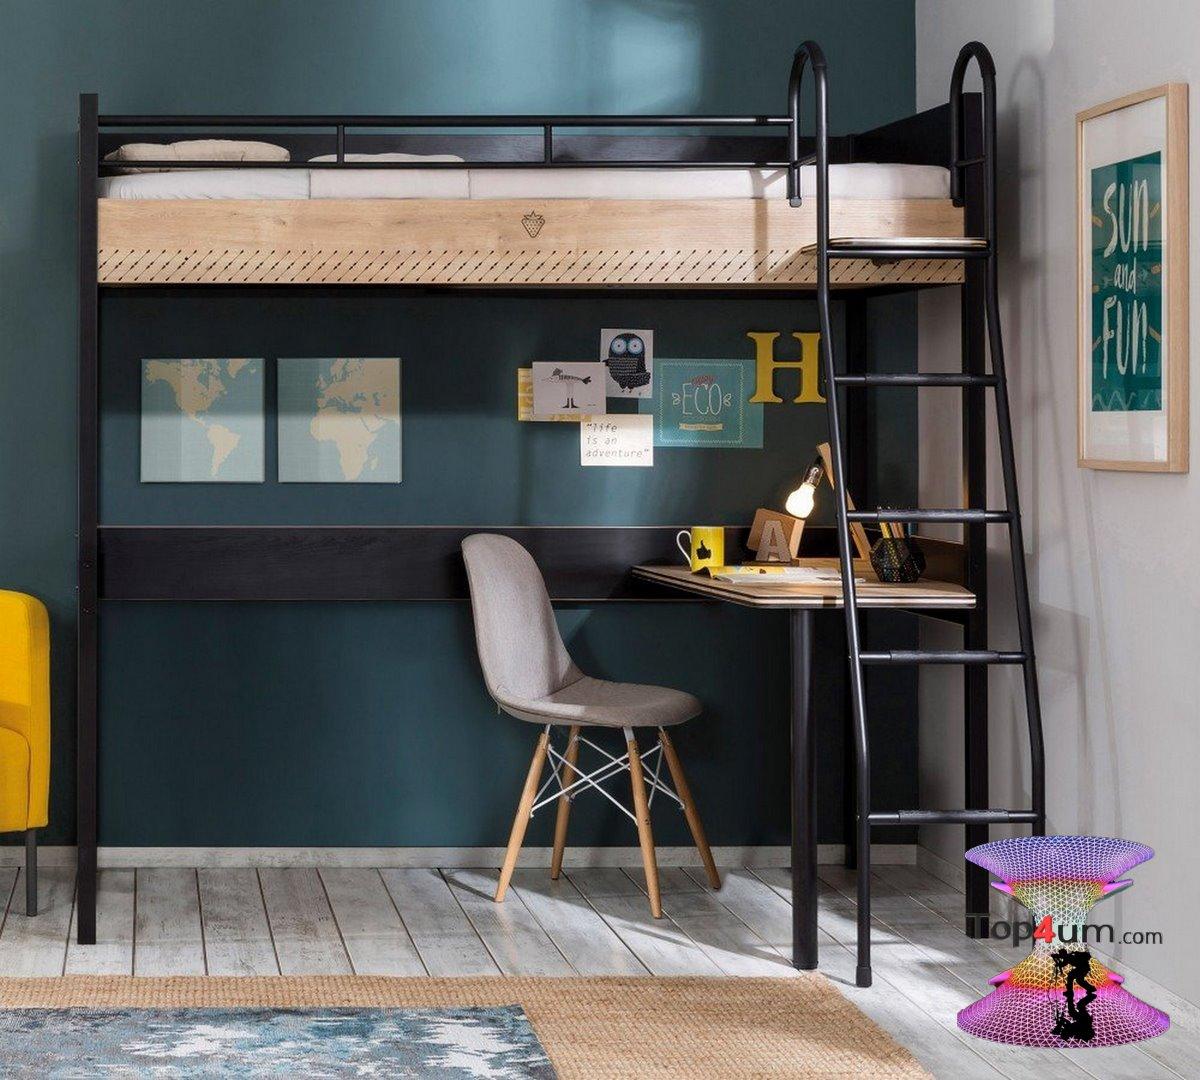 f:id:kitchendesignsegypt:20191020022249j:plain